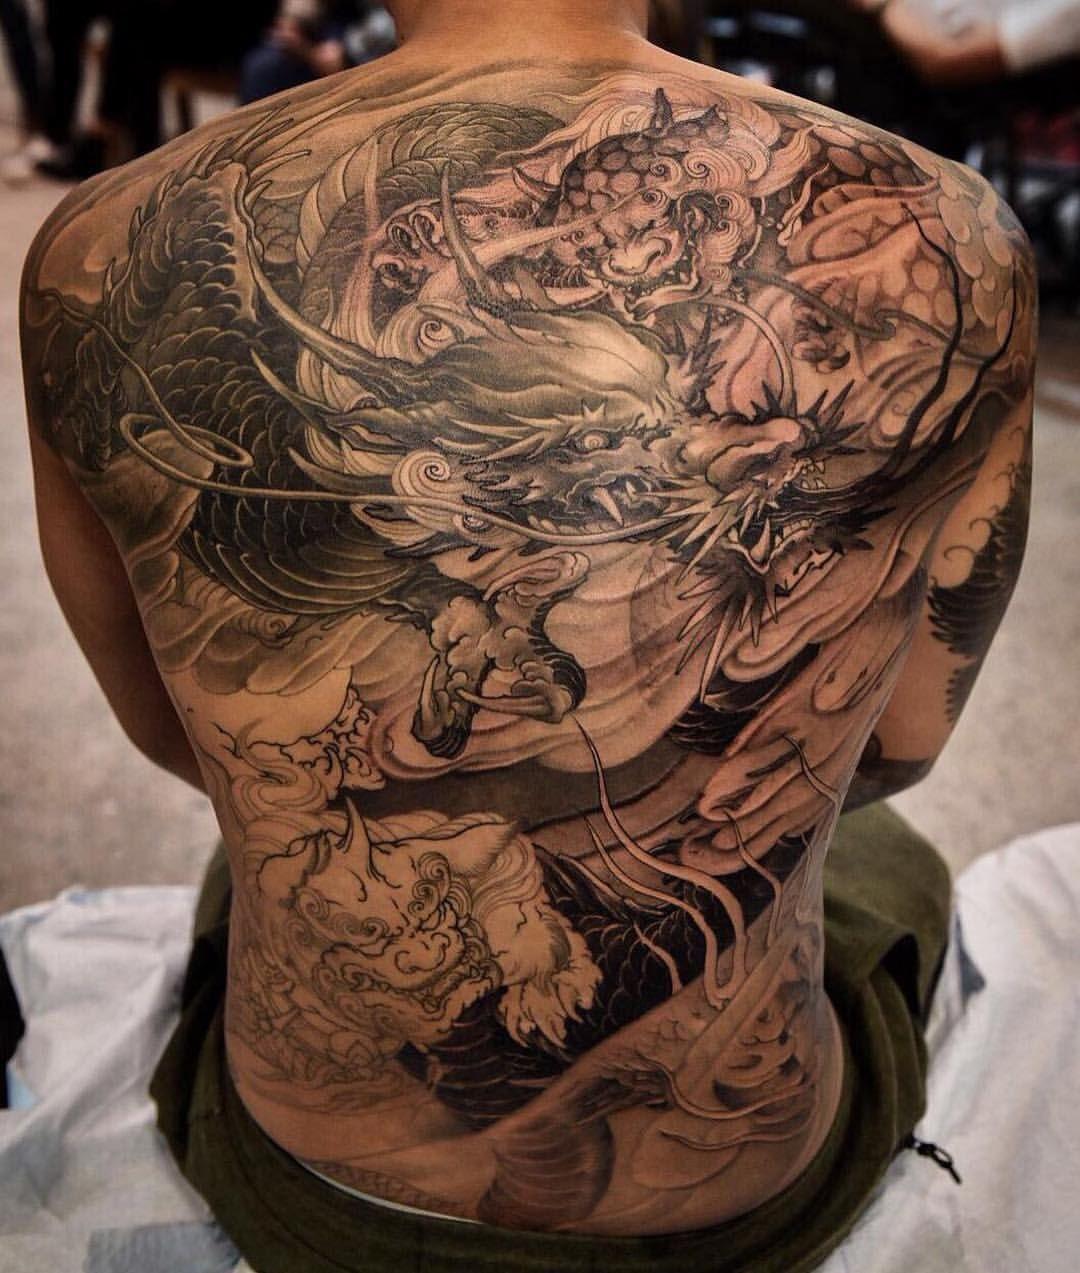 Dragon And Foo Dog Back Piece In Progress By Tristen Chronicink Create Hinh Xăm Rồng Hinh Xăm Y Tưởng Hinh Xăm